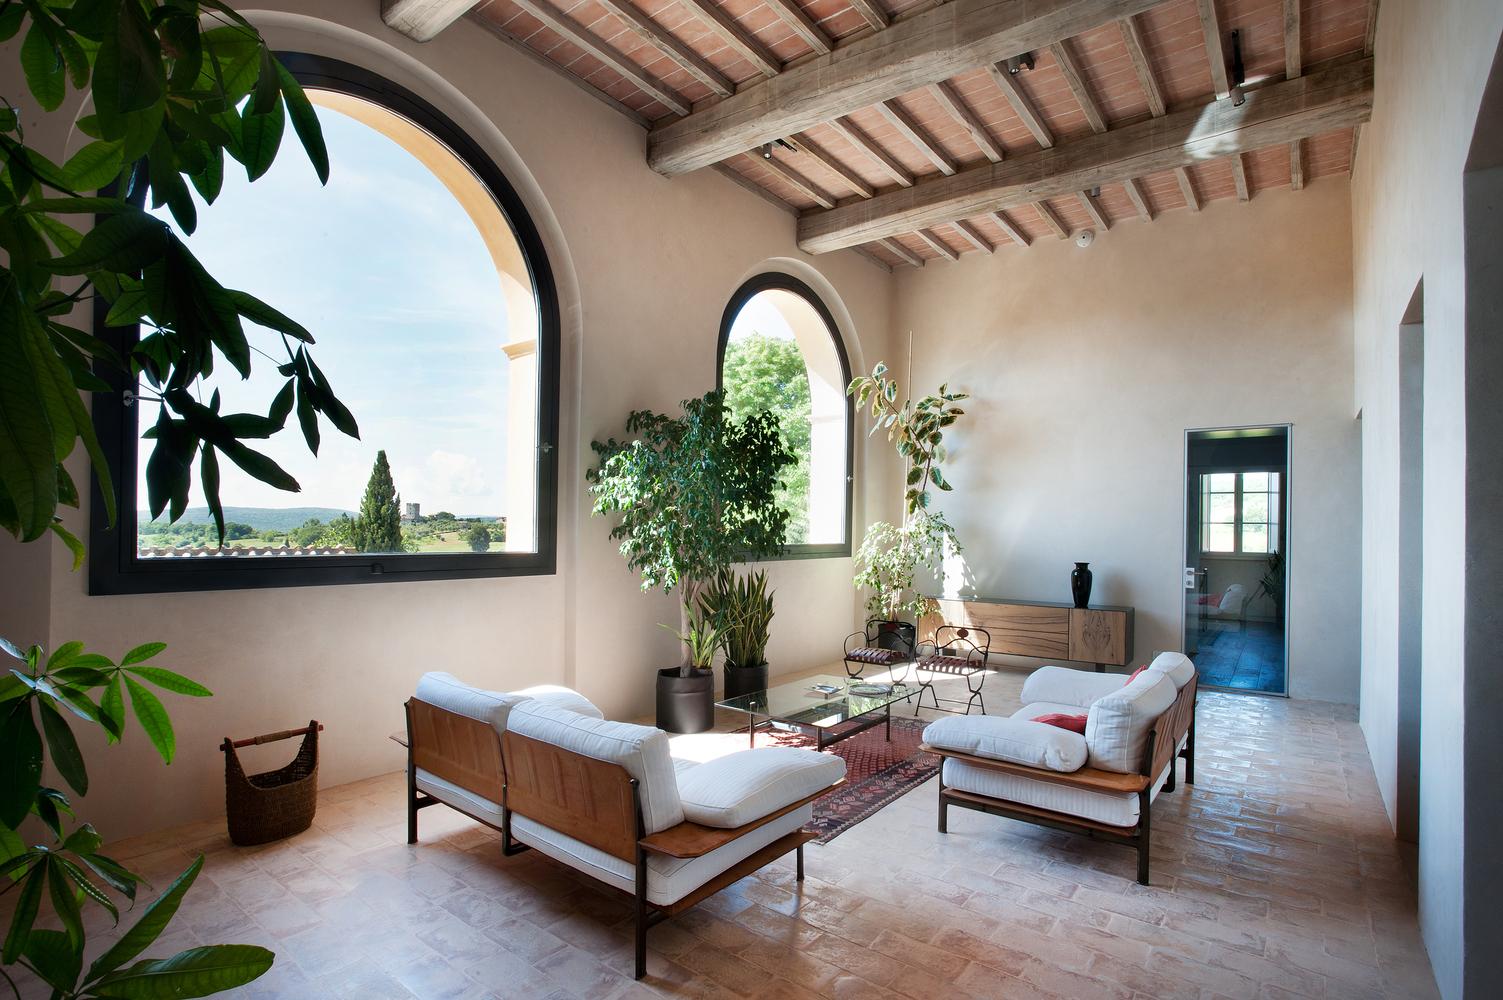 15th Century Italian Villa Renovation By CMT Architects 2